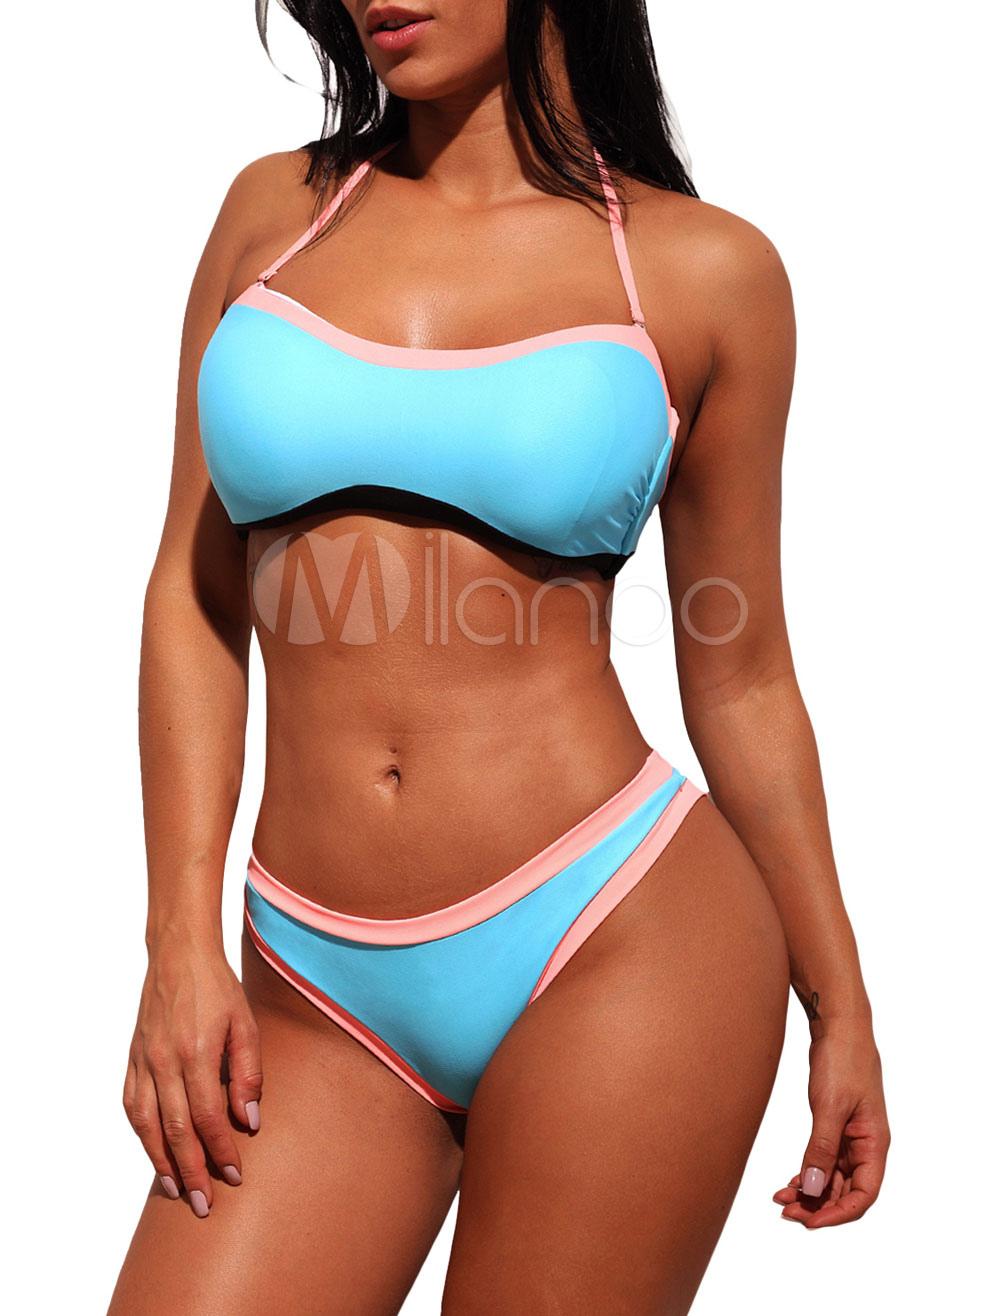 00c664c1ad7 Sexy Bikini Swimsuit Halter Two Tone String Bikini Beach Bathing Suit